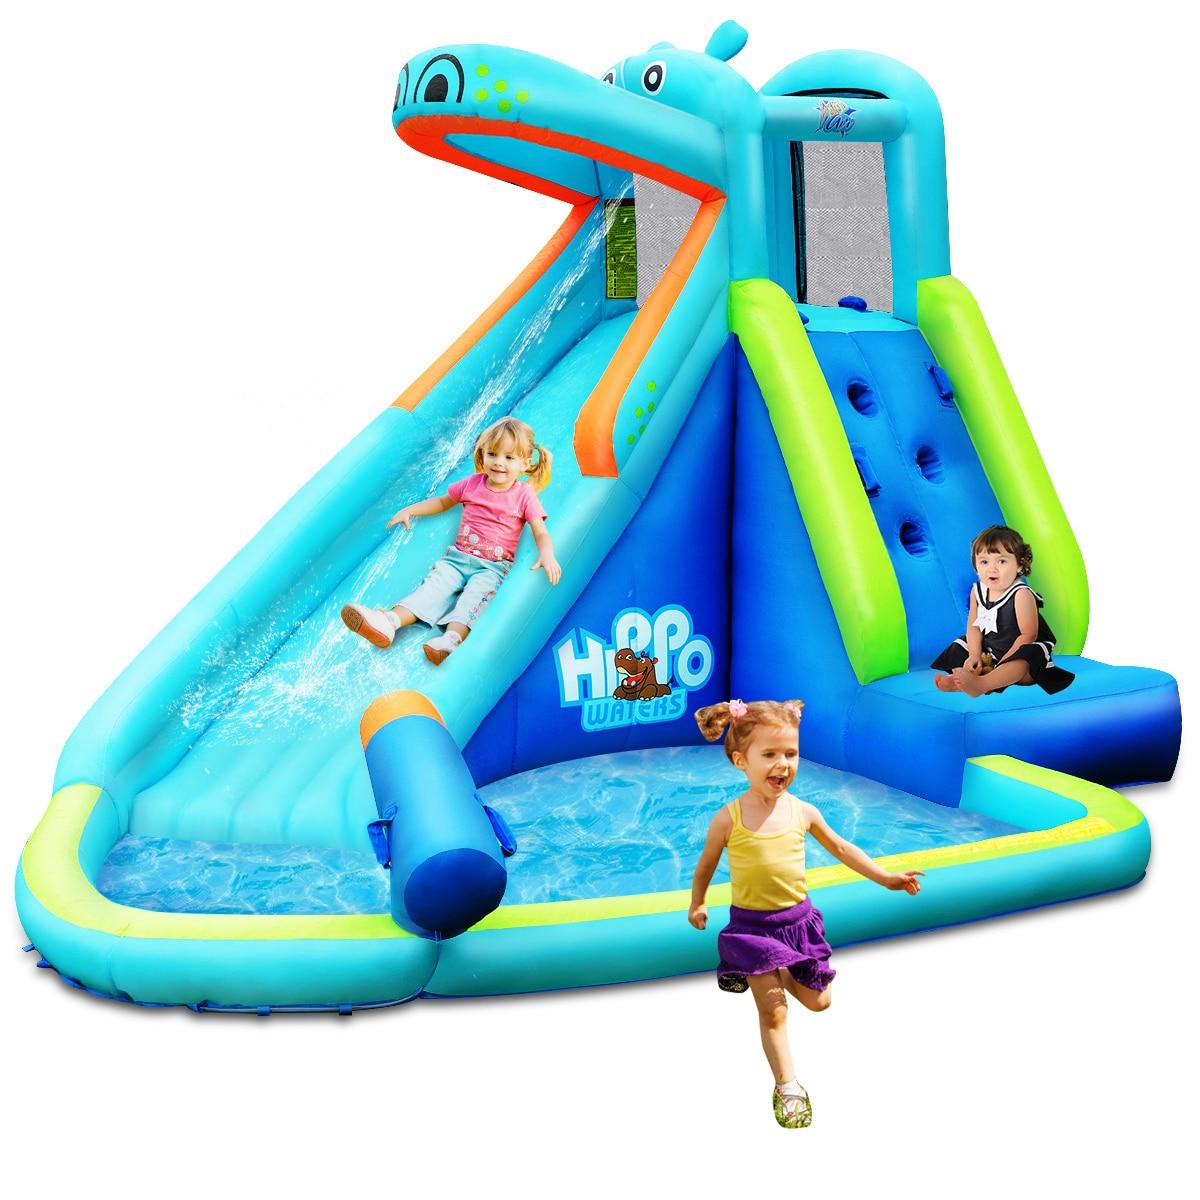 Inflable para niños, hipopótamo, casa de rebote, Tobogán, pared de escalada, piscina contra salpicaduras con bolsa